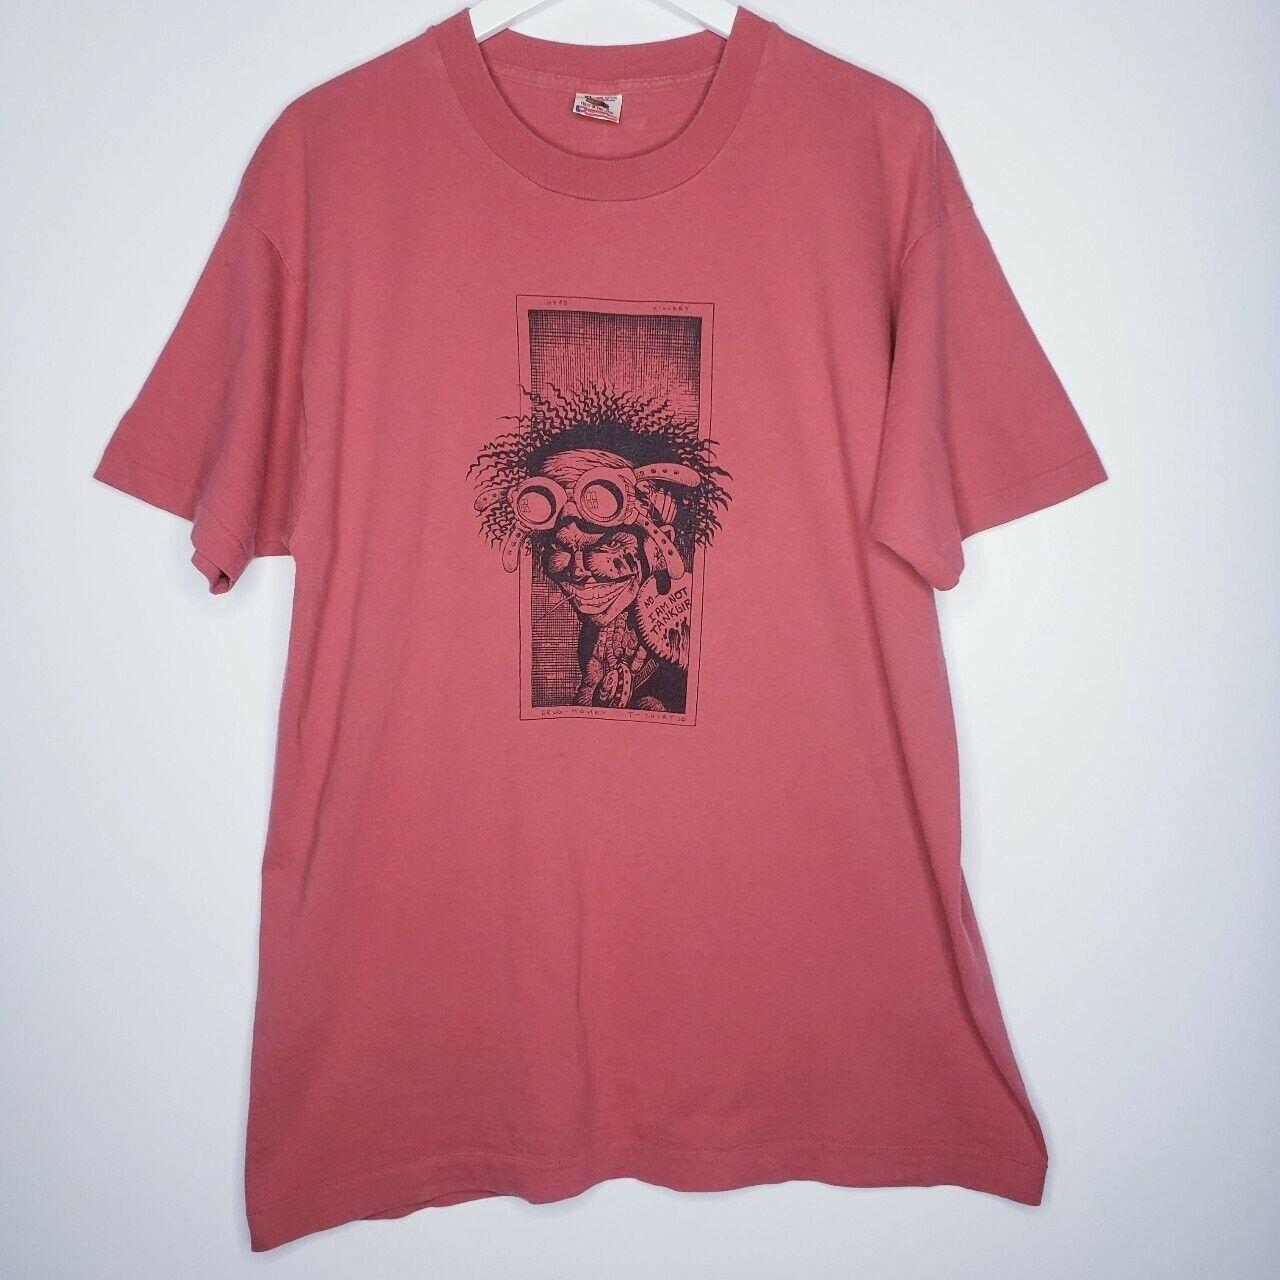 Vampire Hunter D Vintage Tshirt Tee XL Anime